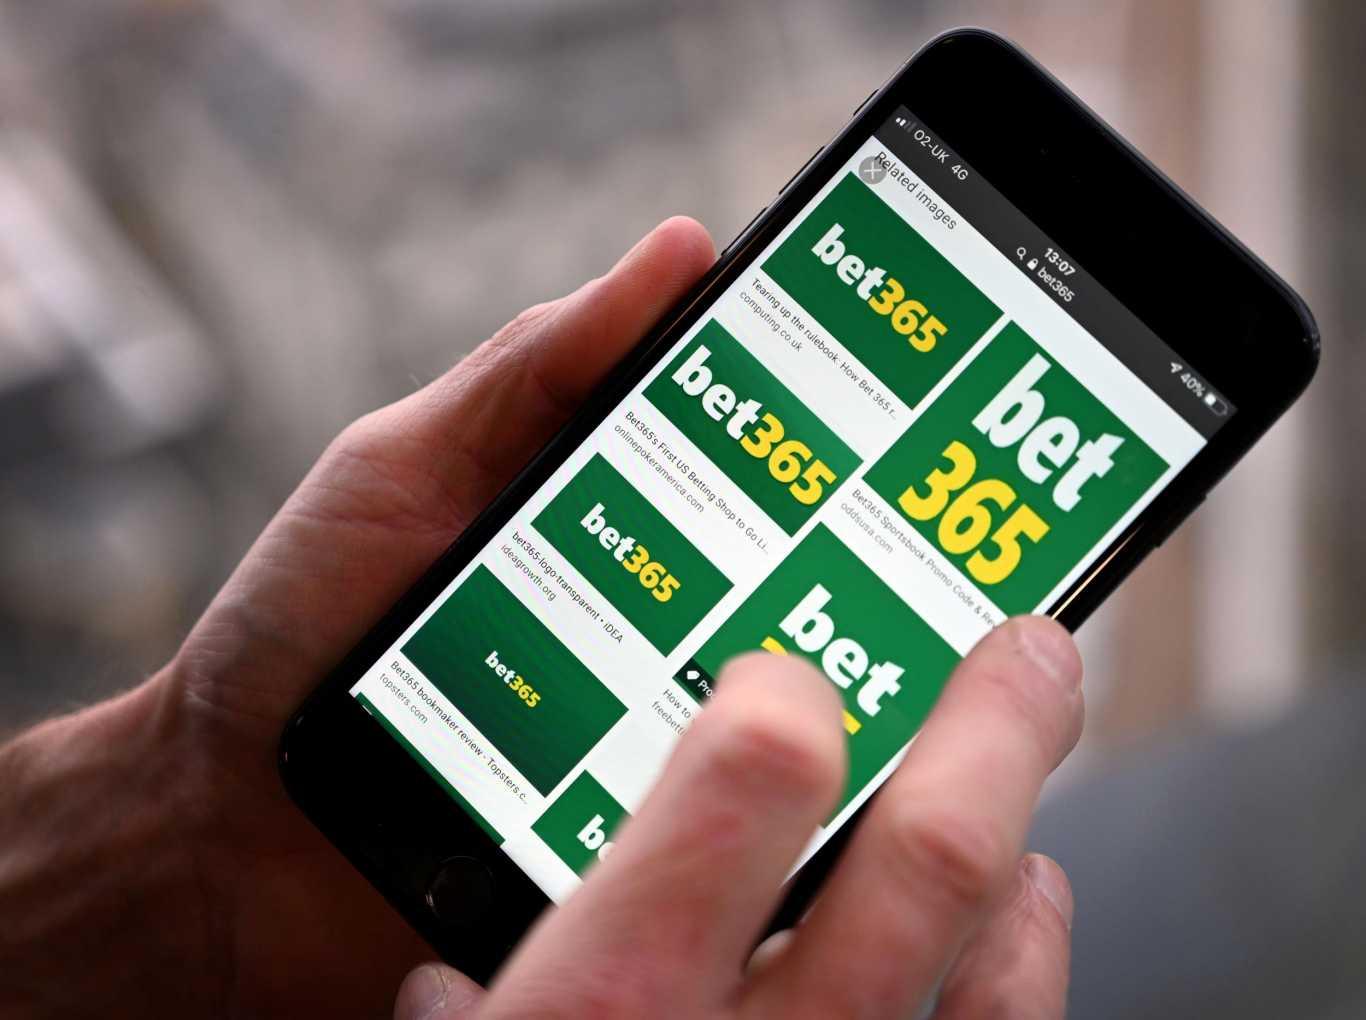 Bet365 Tanzania sportsbook and casino mobile app